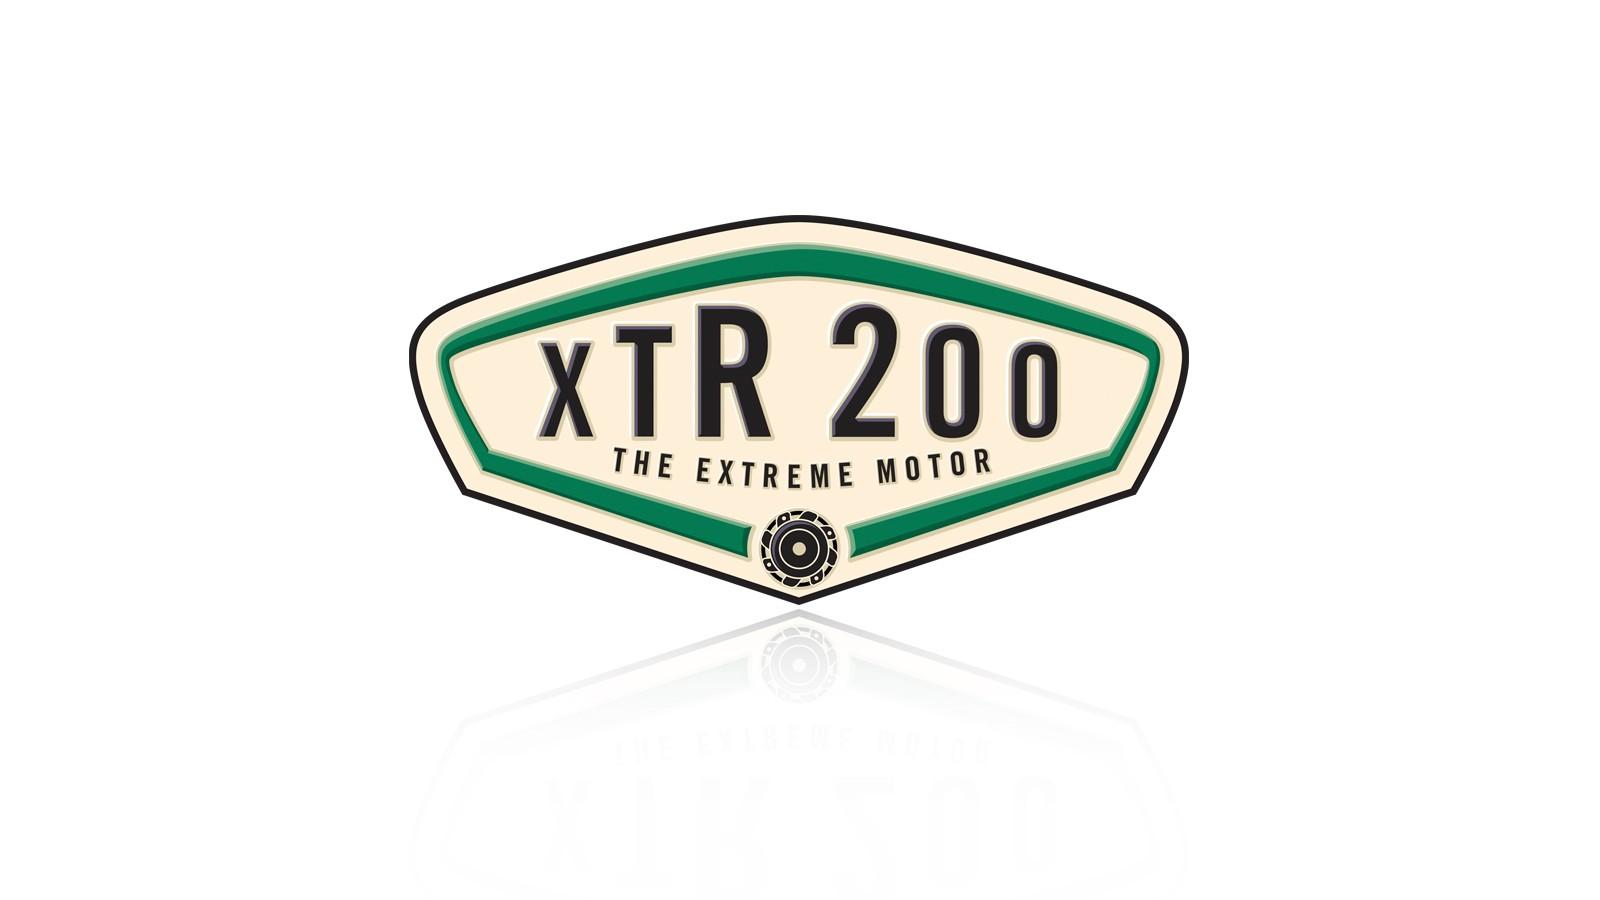 XTR 200 LOGO